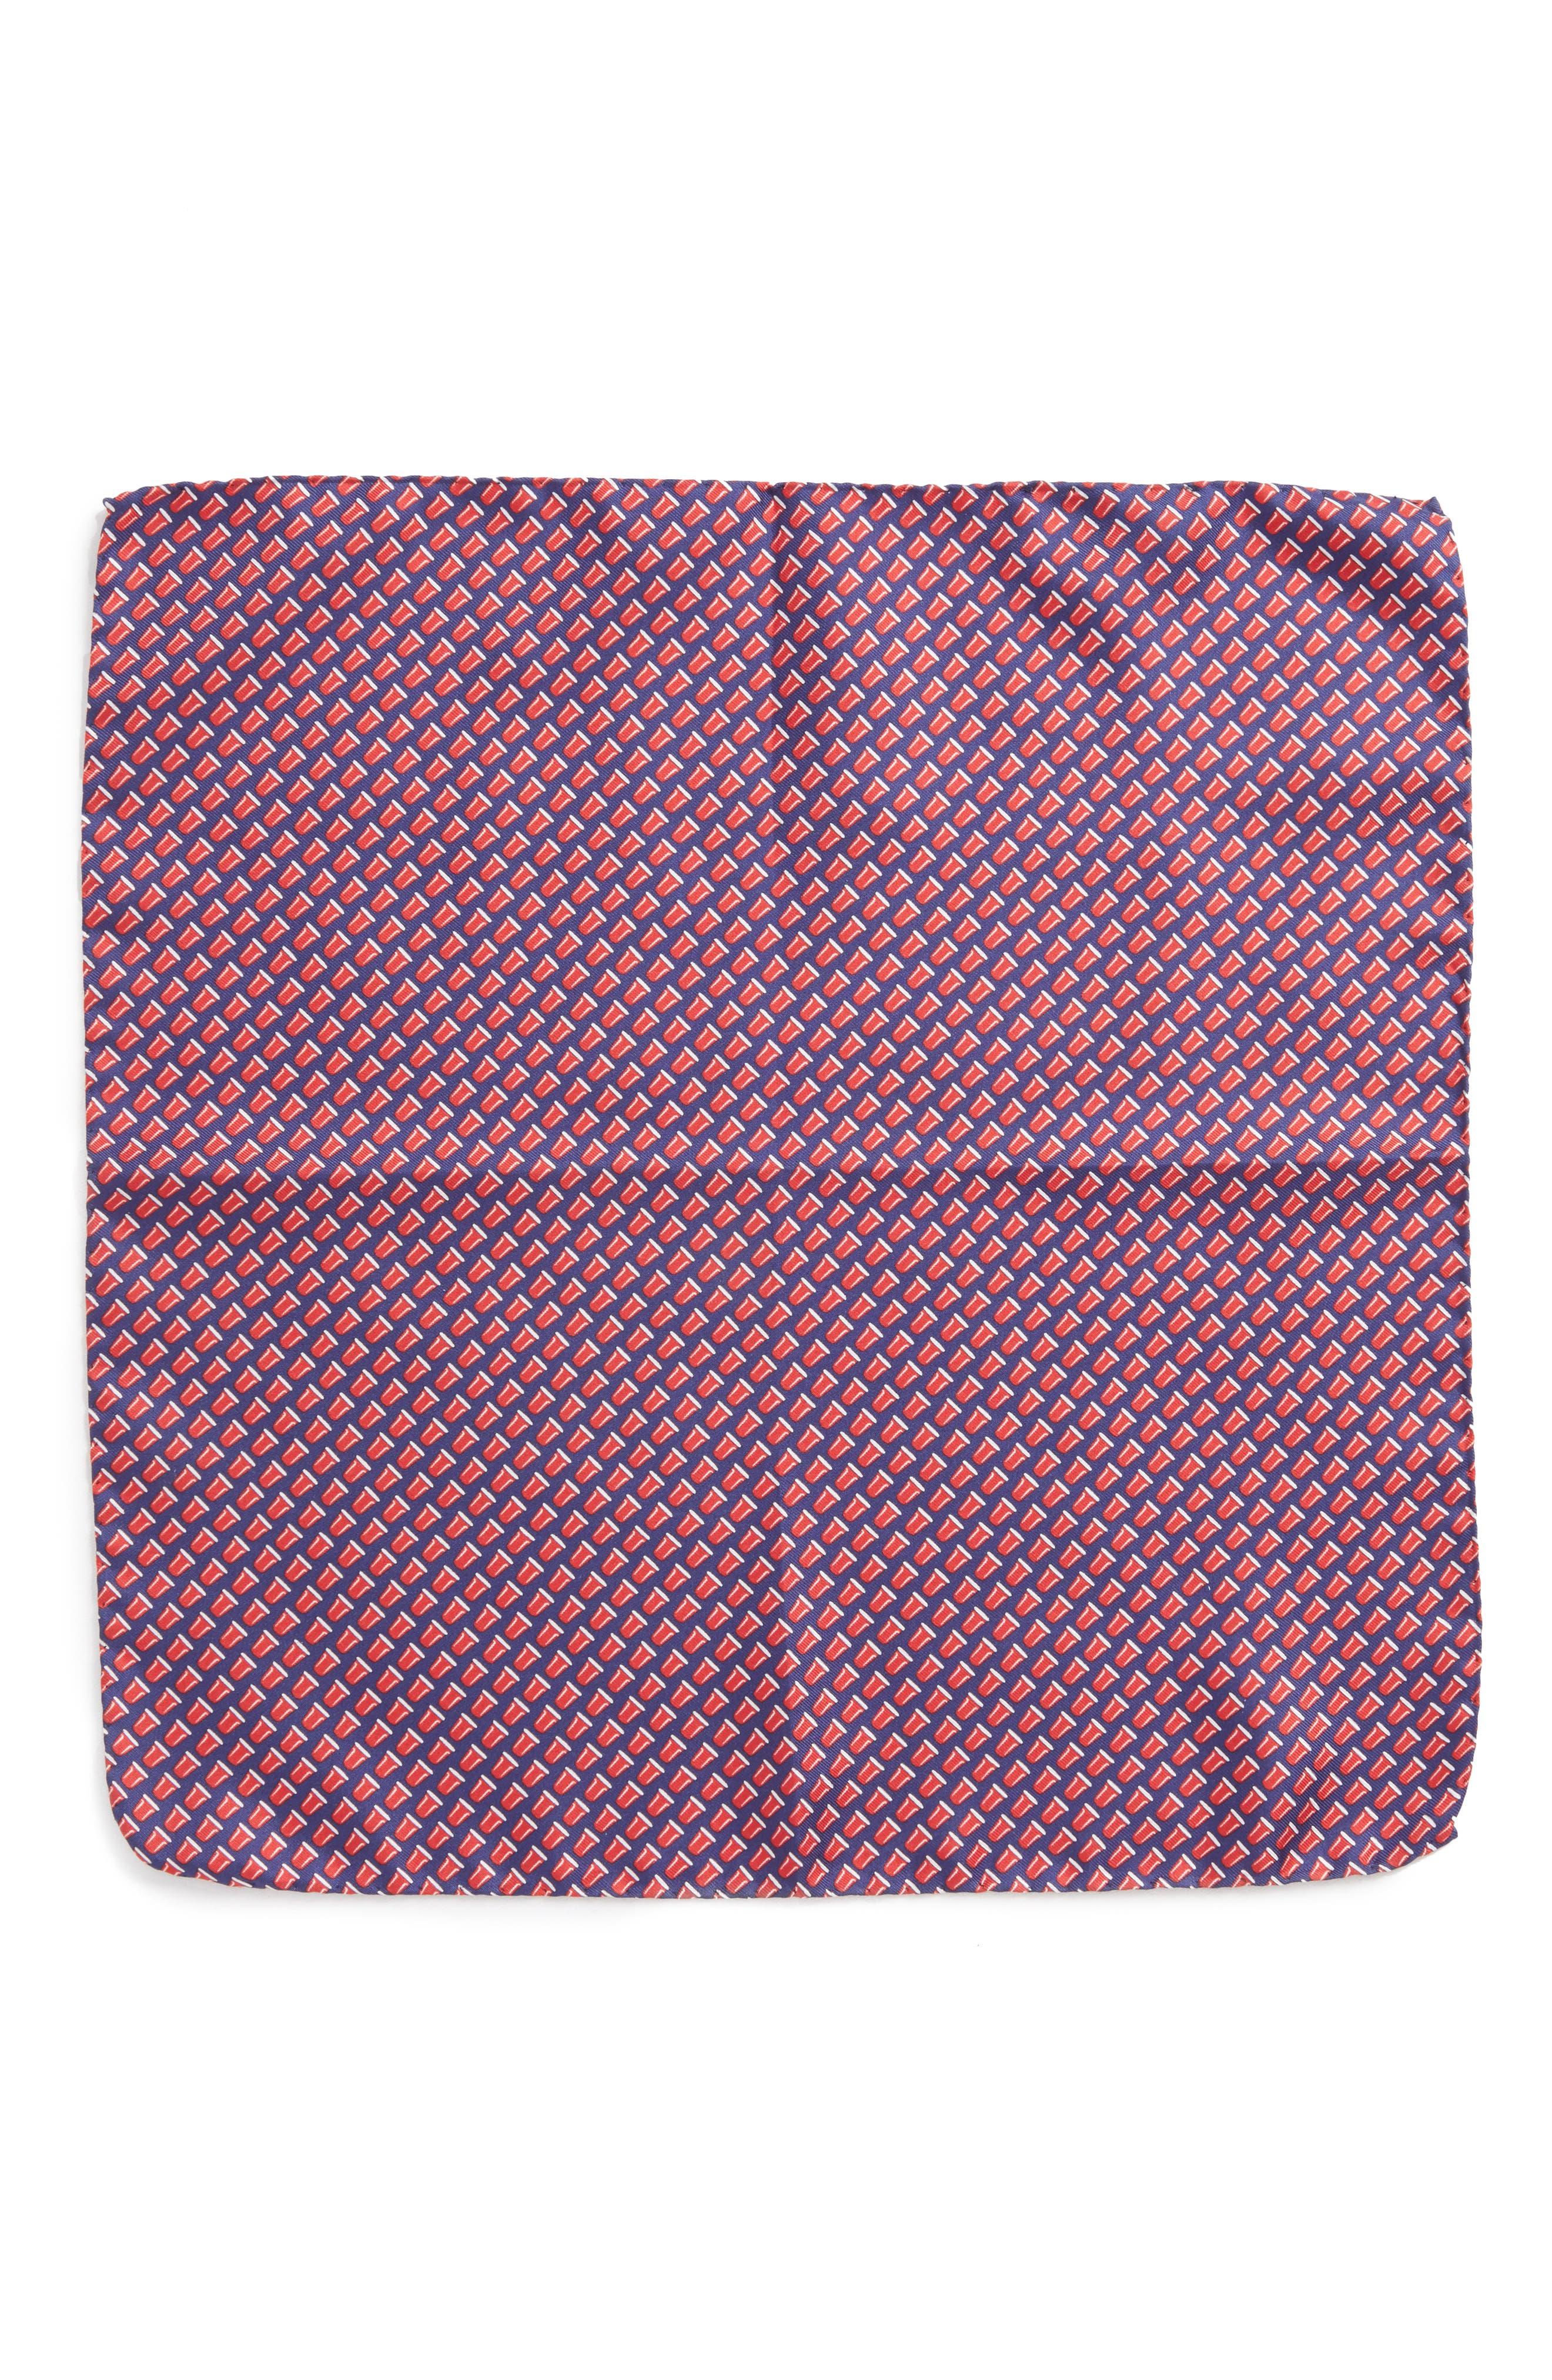 Re-Rack Silk Pocket Square,                             Alternate thumbnail 2, color,                             NAVY